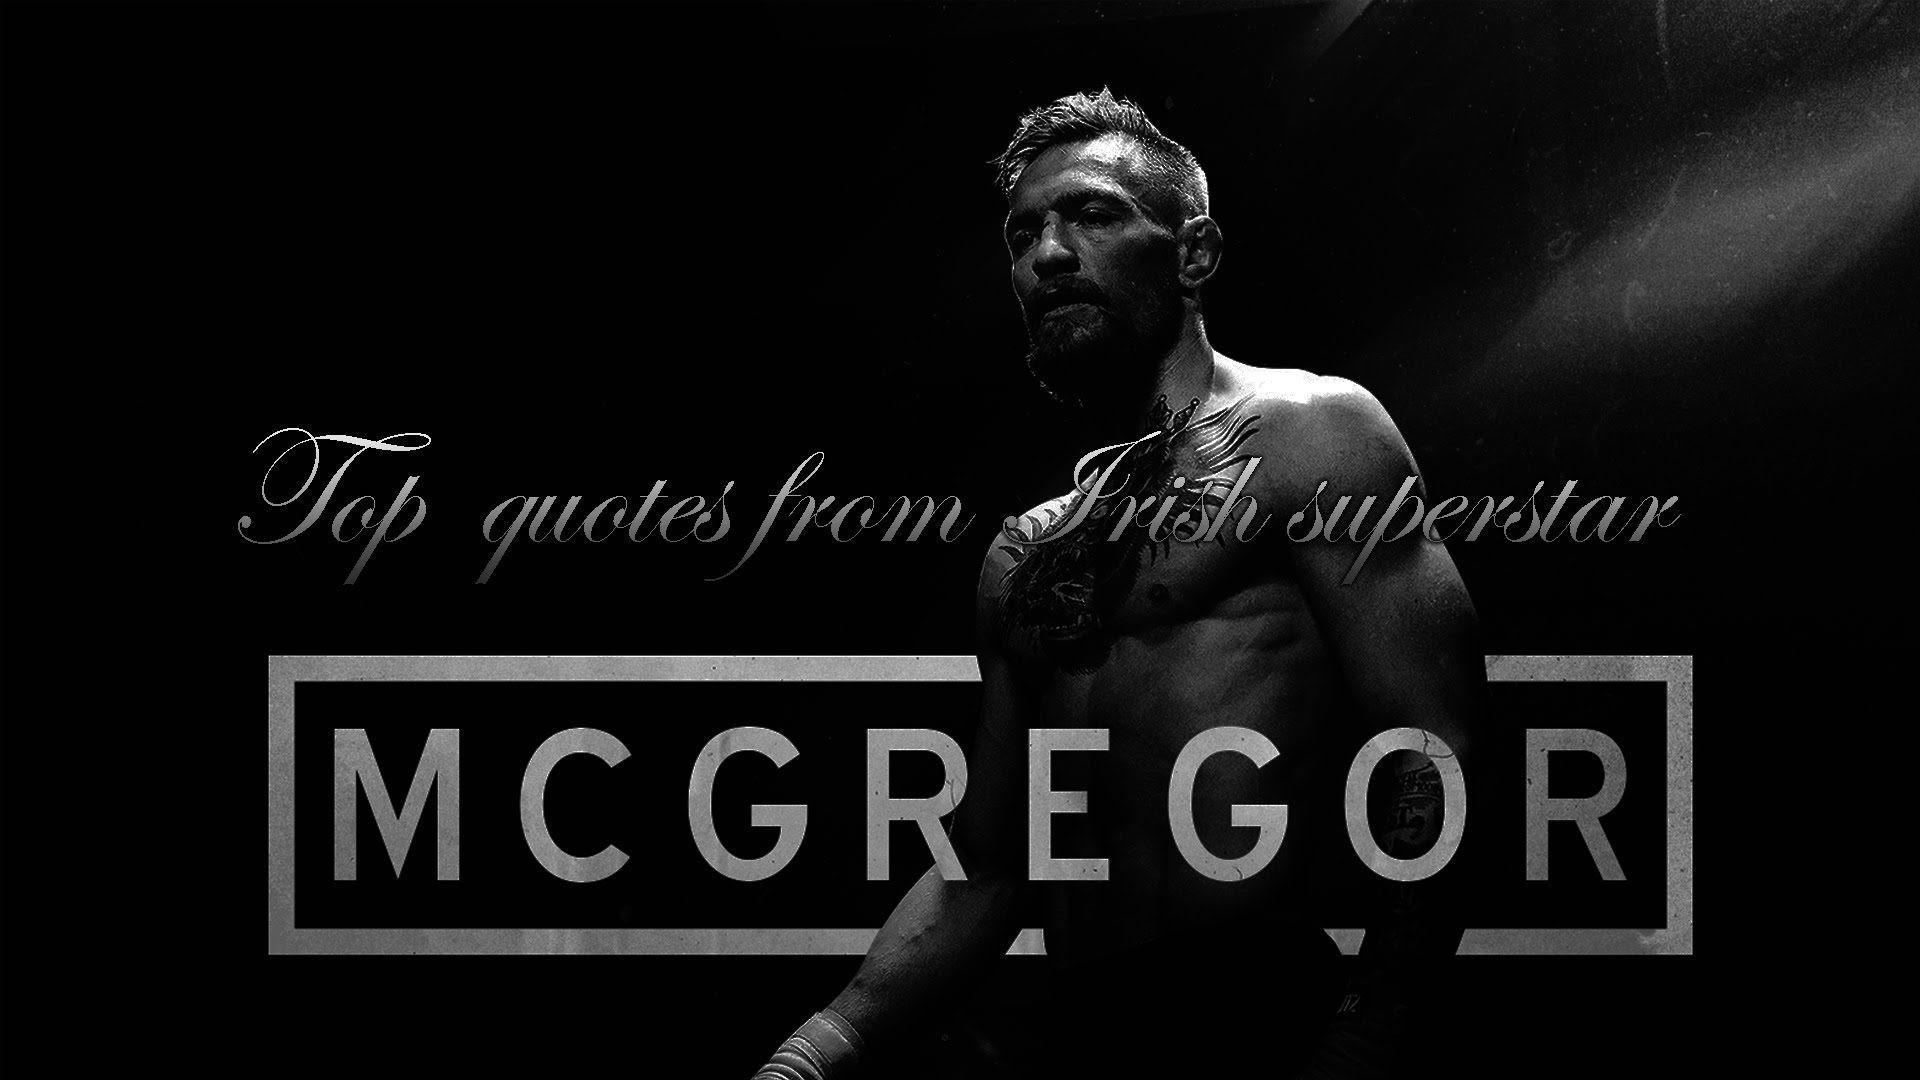 Conor McGregor wallpaper ·① Download free full HD ...